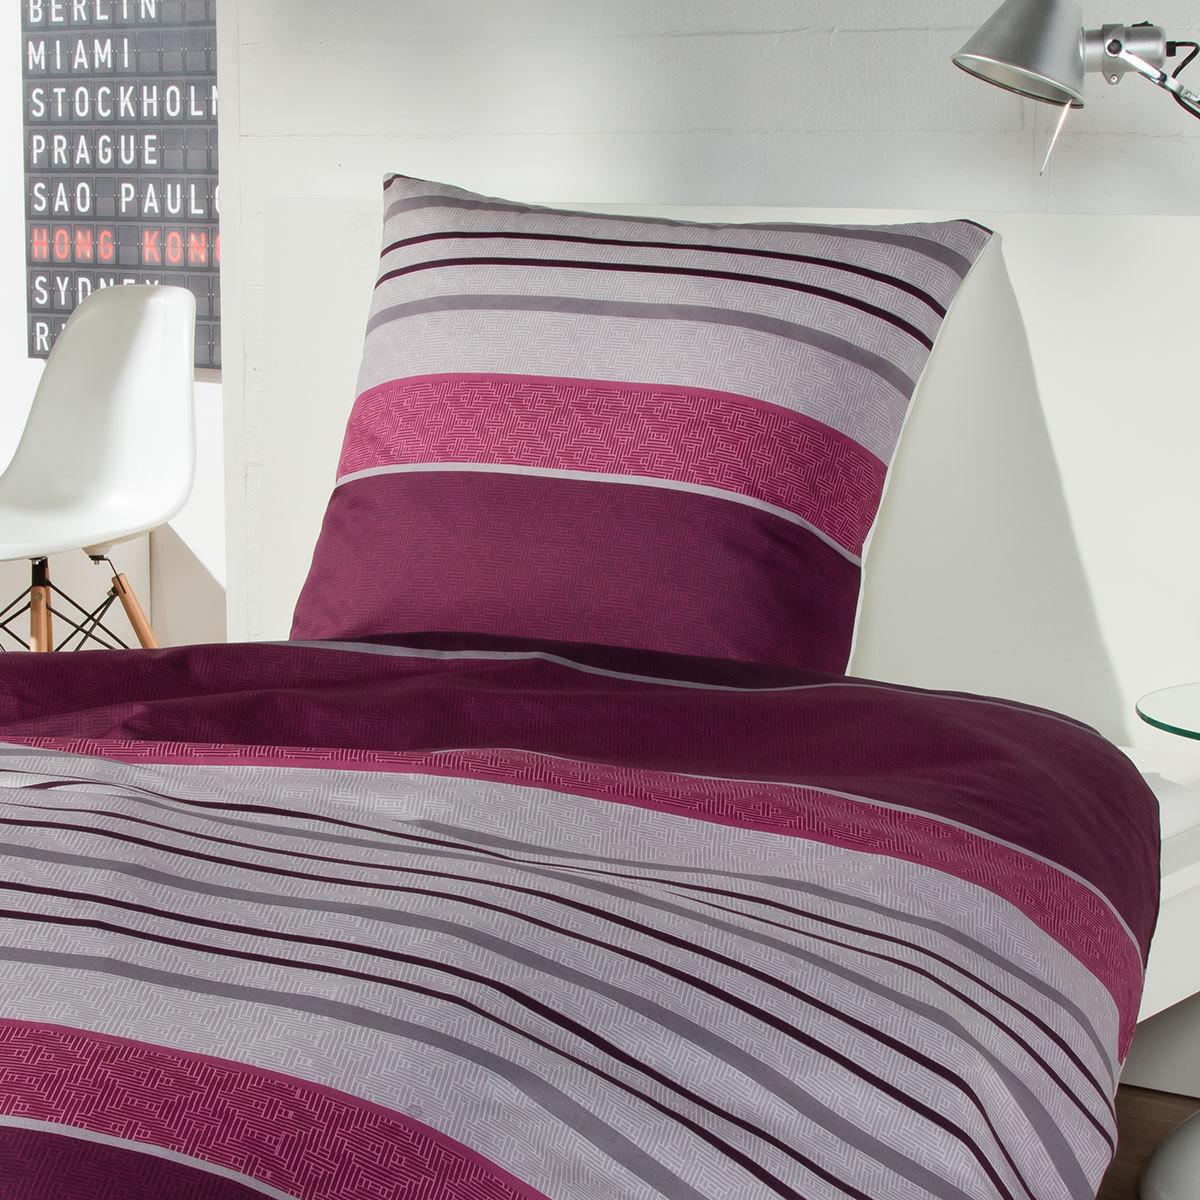 s oliver feinflanell bettw sche z rich weinrot g nstig. Black Bedroom Furniture Sets. Home Design Ideas